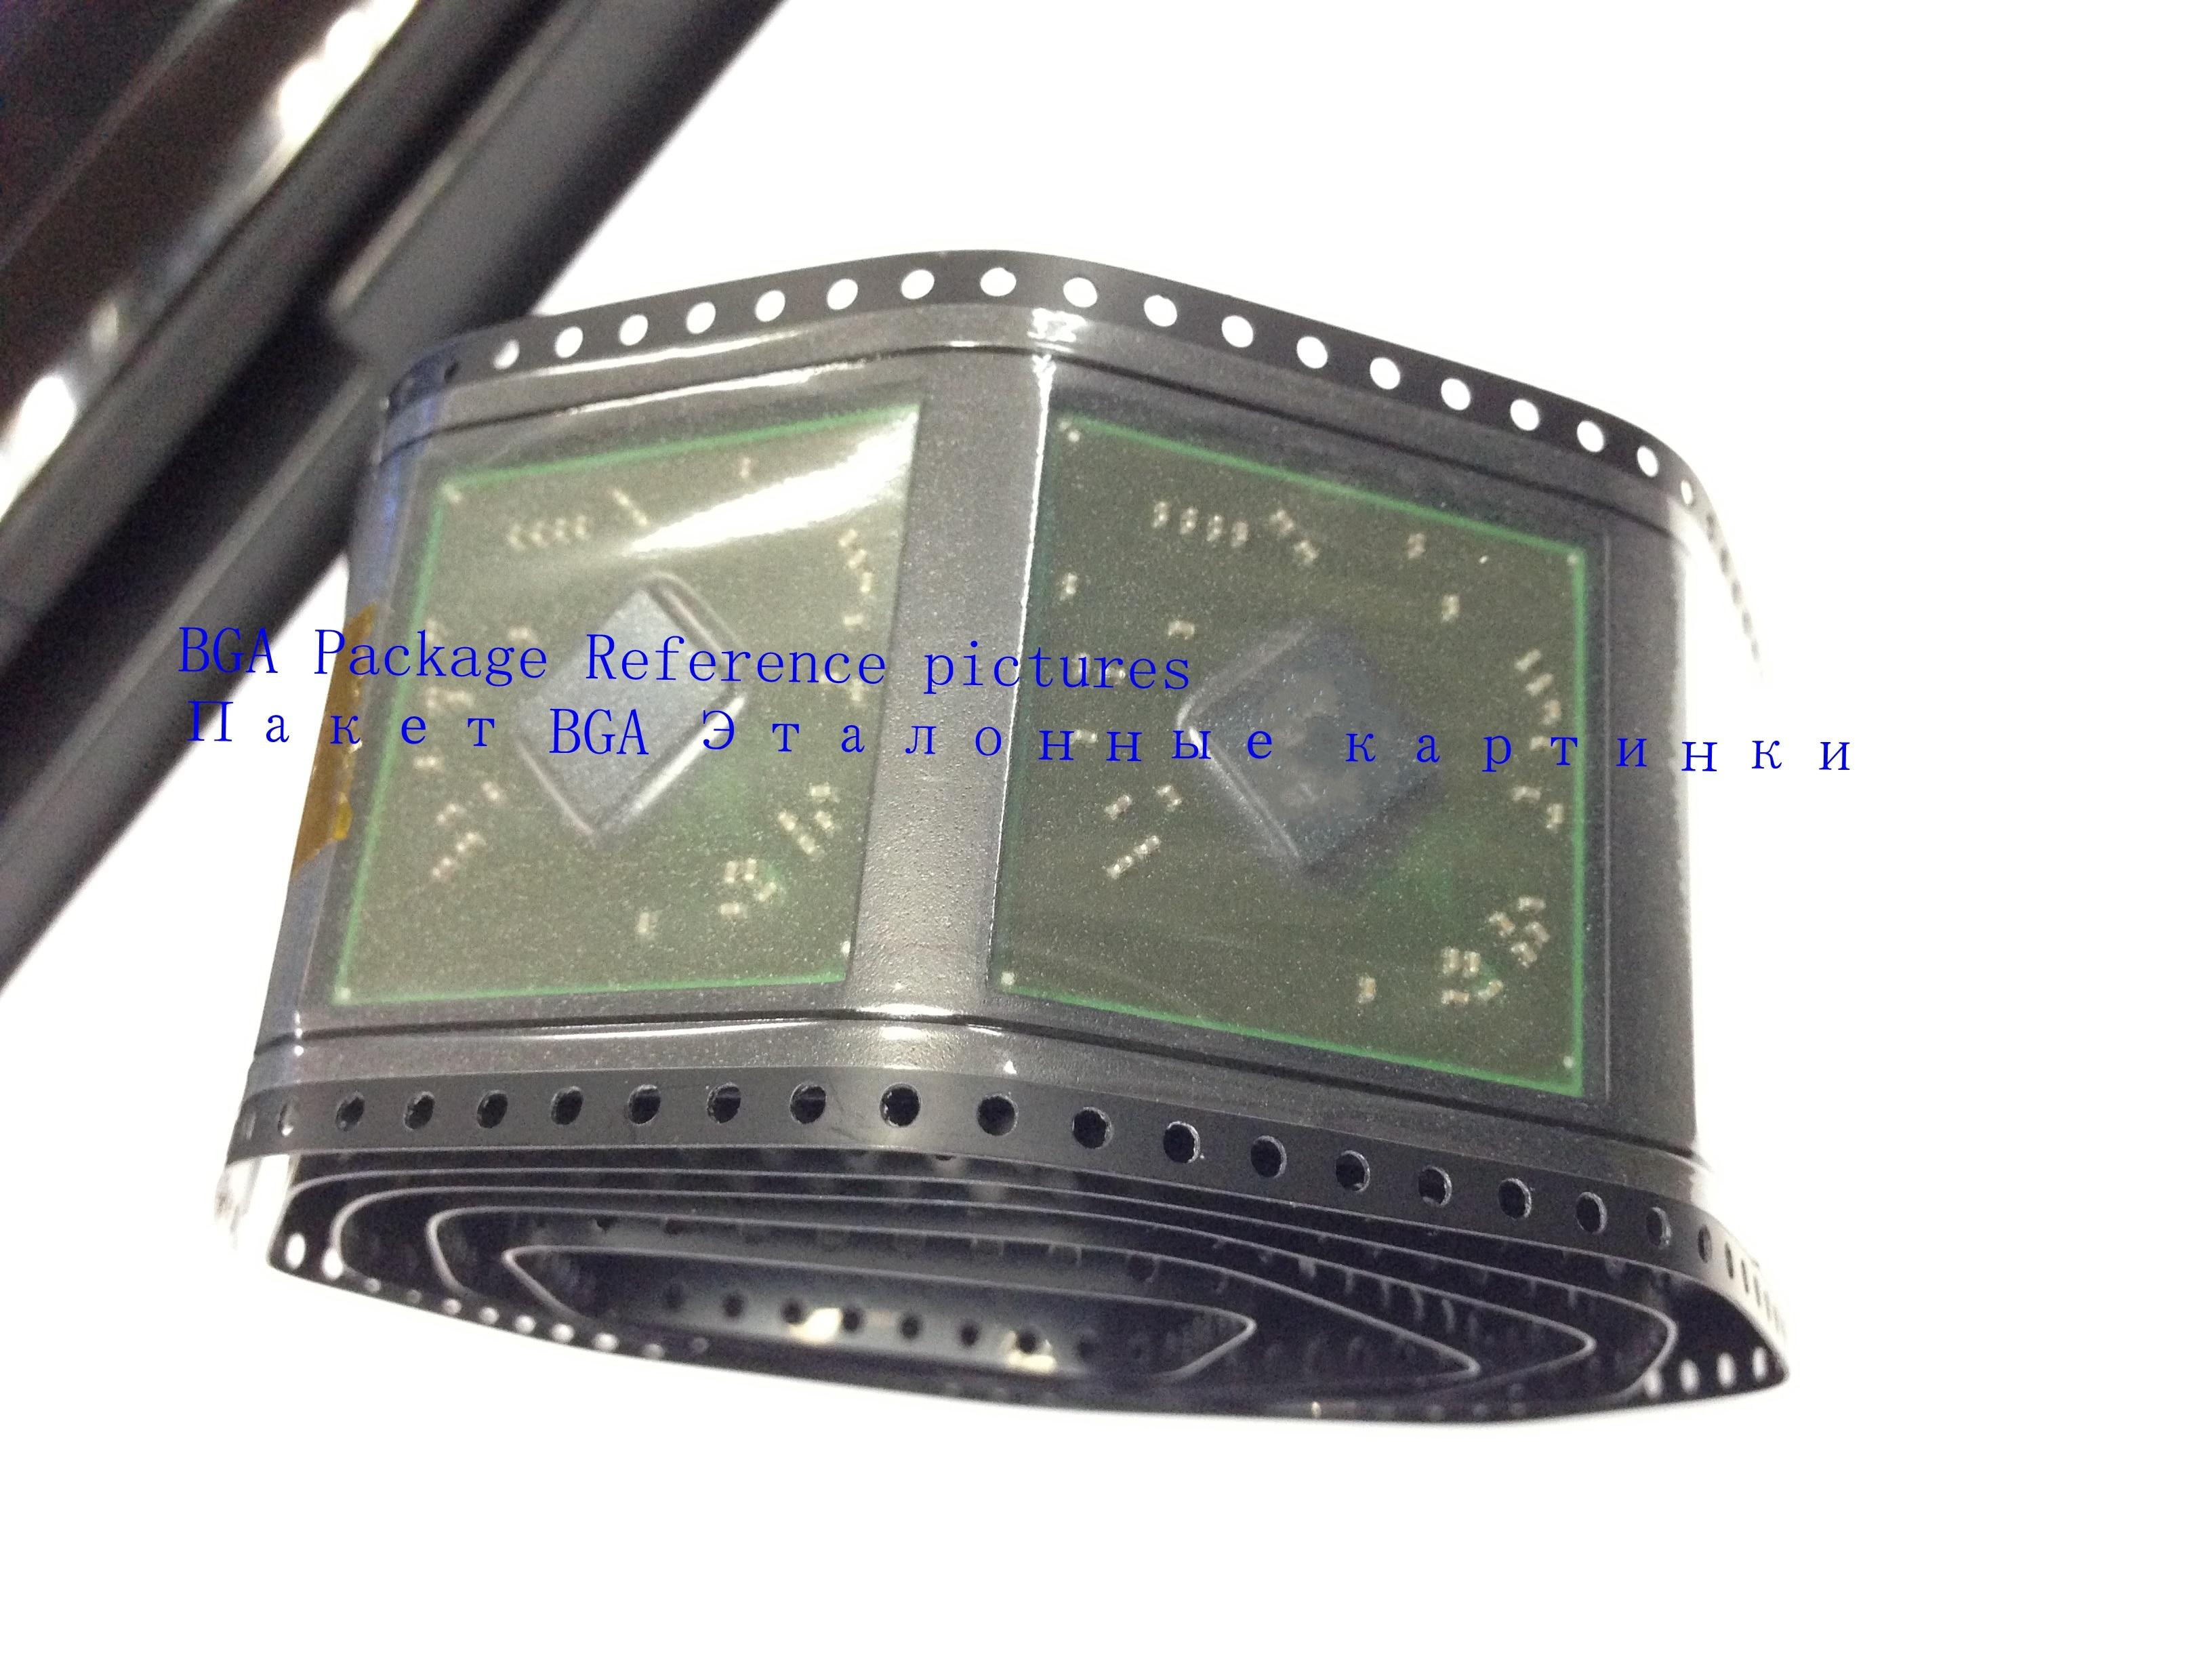 1pcs/lot 100% New GF-9400J-DC-I-B3 GF 9400J DC I B3 BGA Chipset1pcs/lot 100% New GF-9400J-DC-I-B3 GF 9400J DC I B3 BGA Chipset